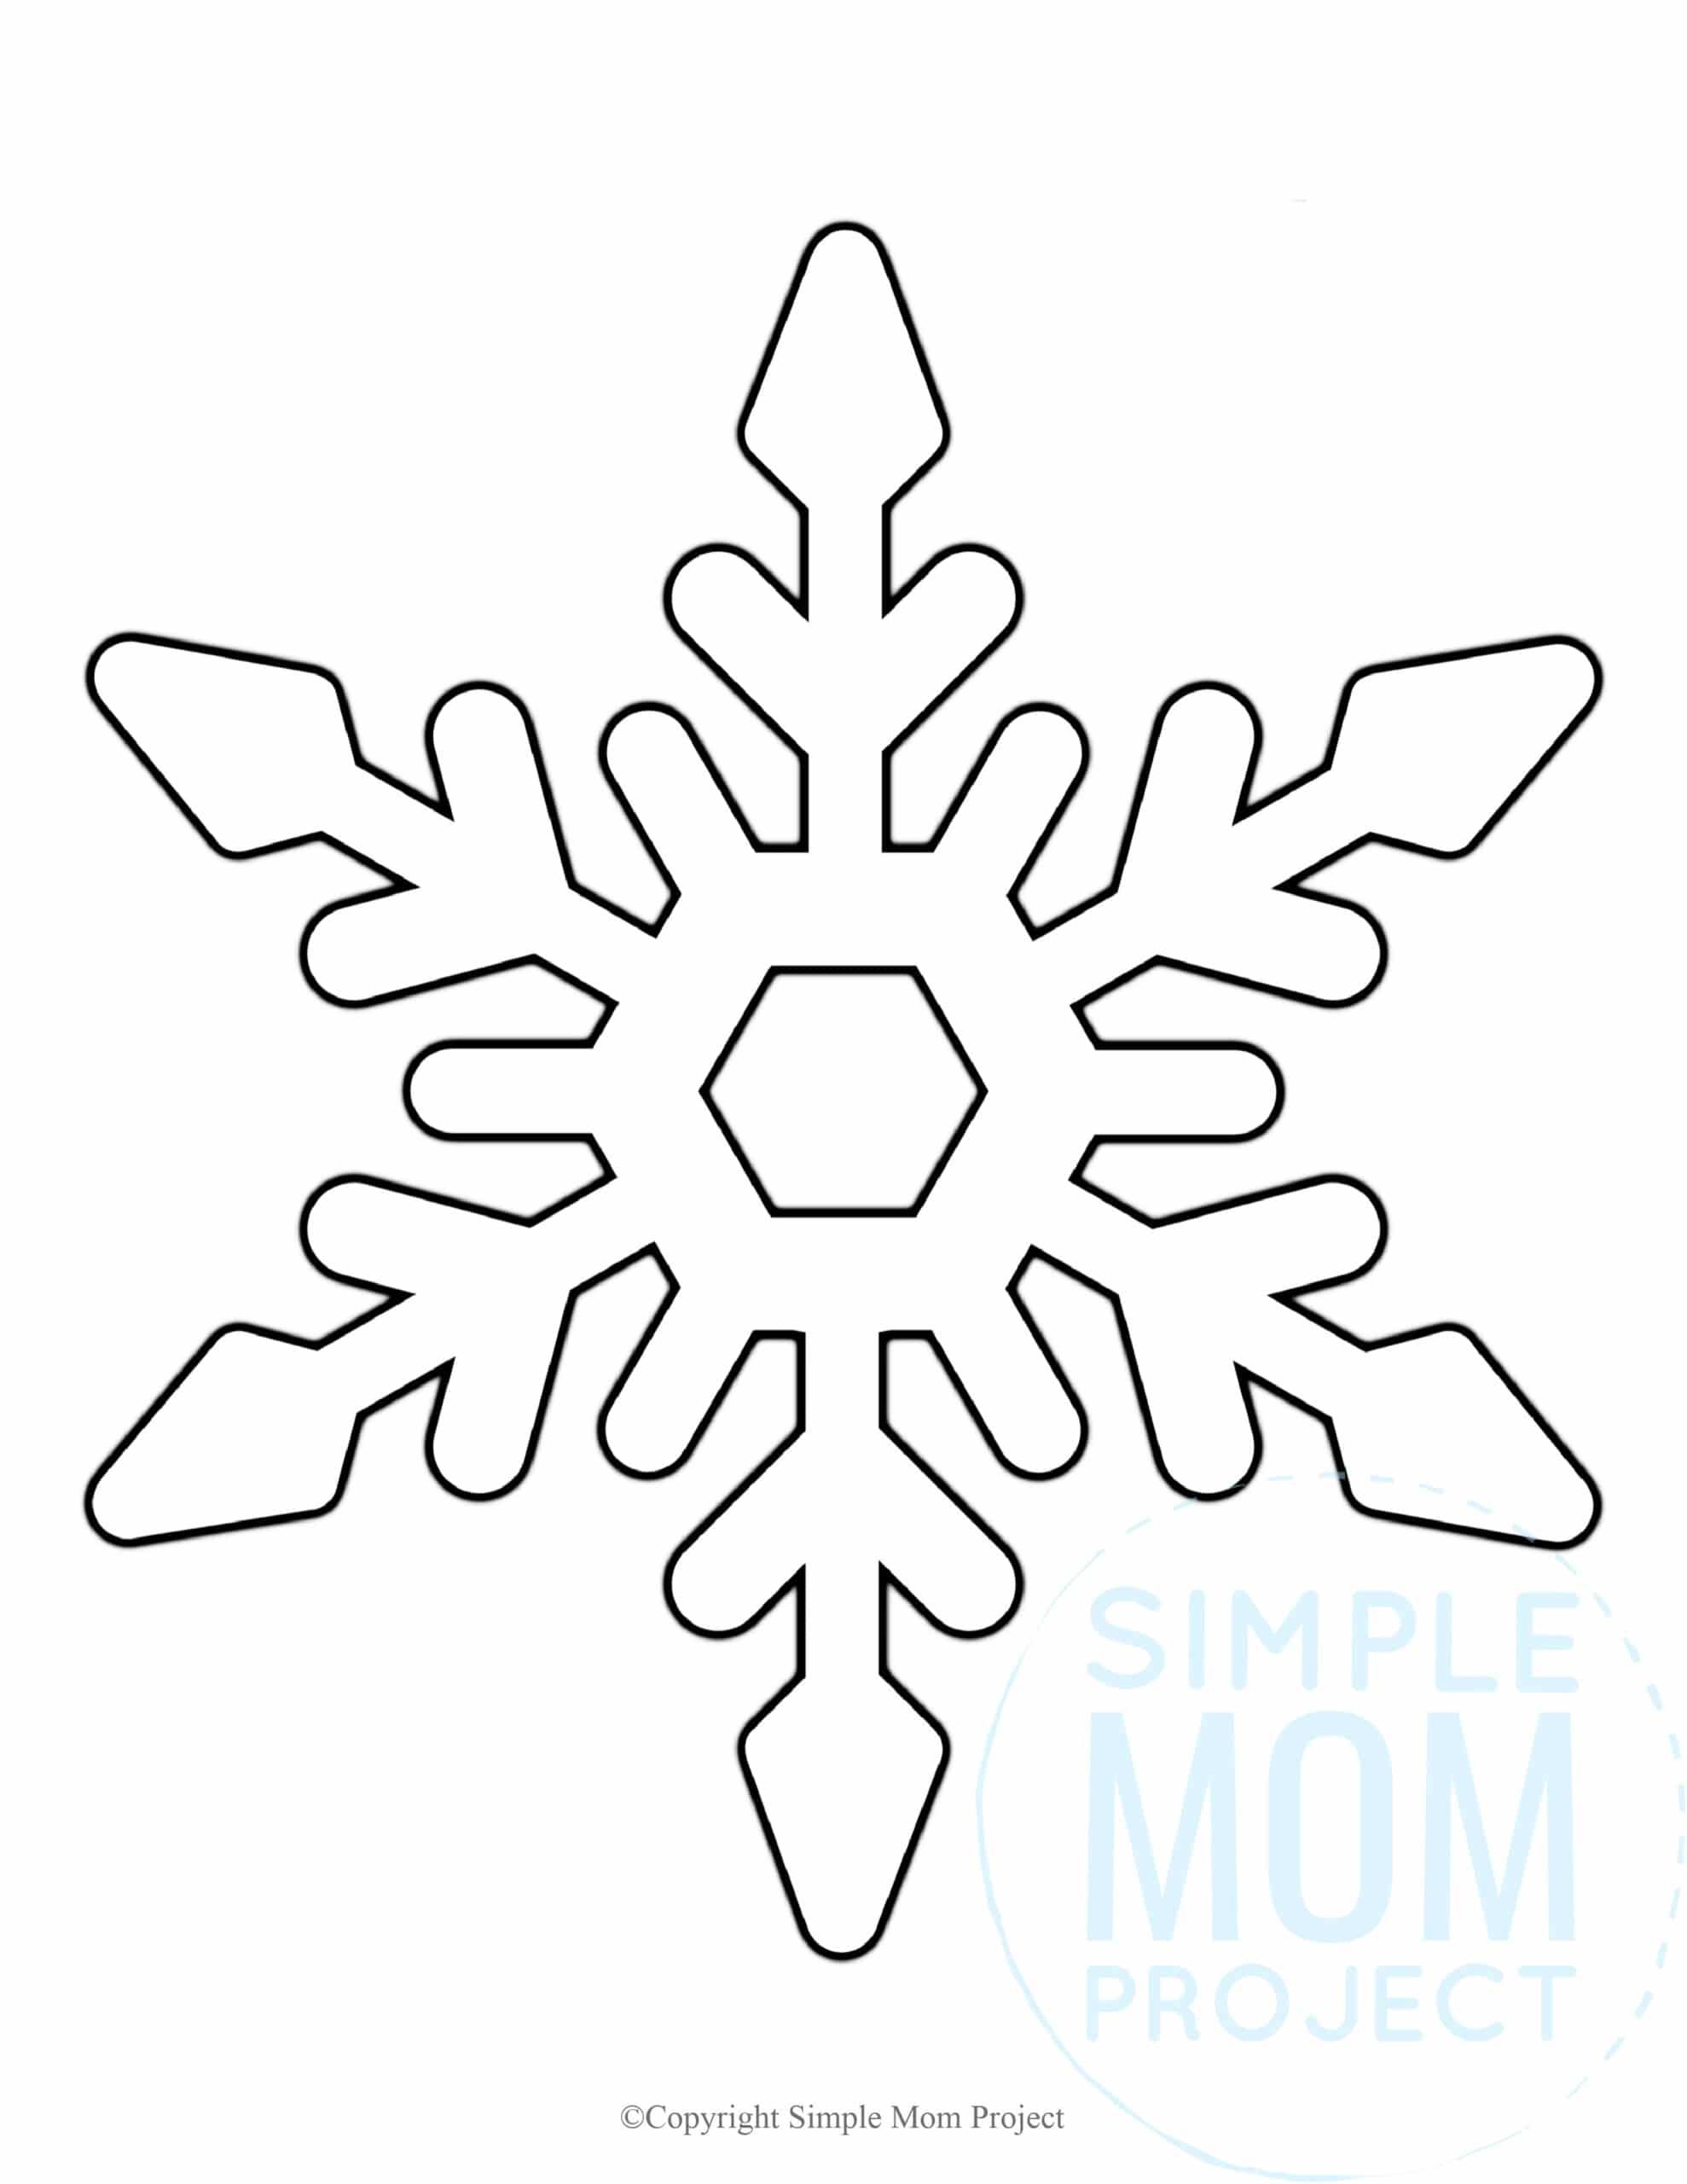 Printable Snowflake template, snowflake pattern, snowflake stencil, snowflake outline for kids winter crafts